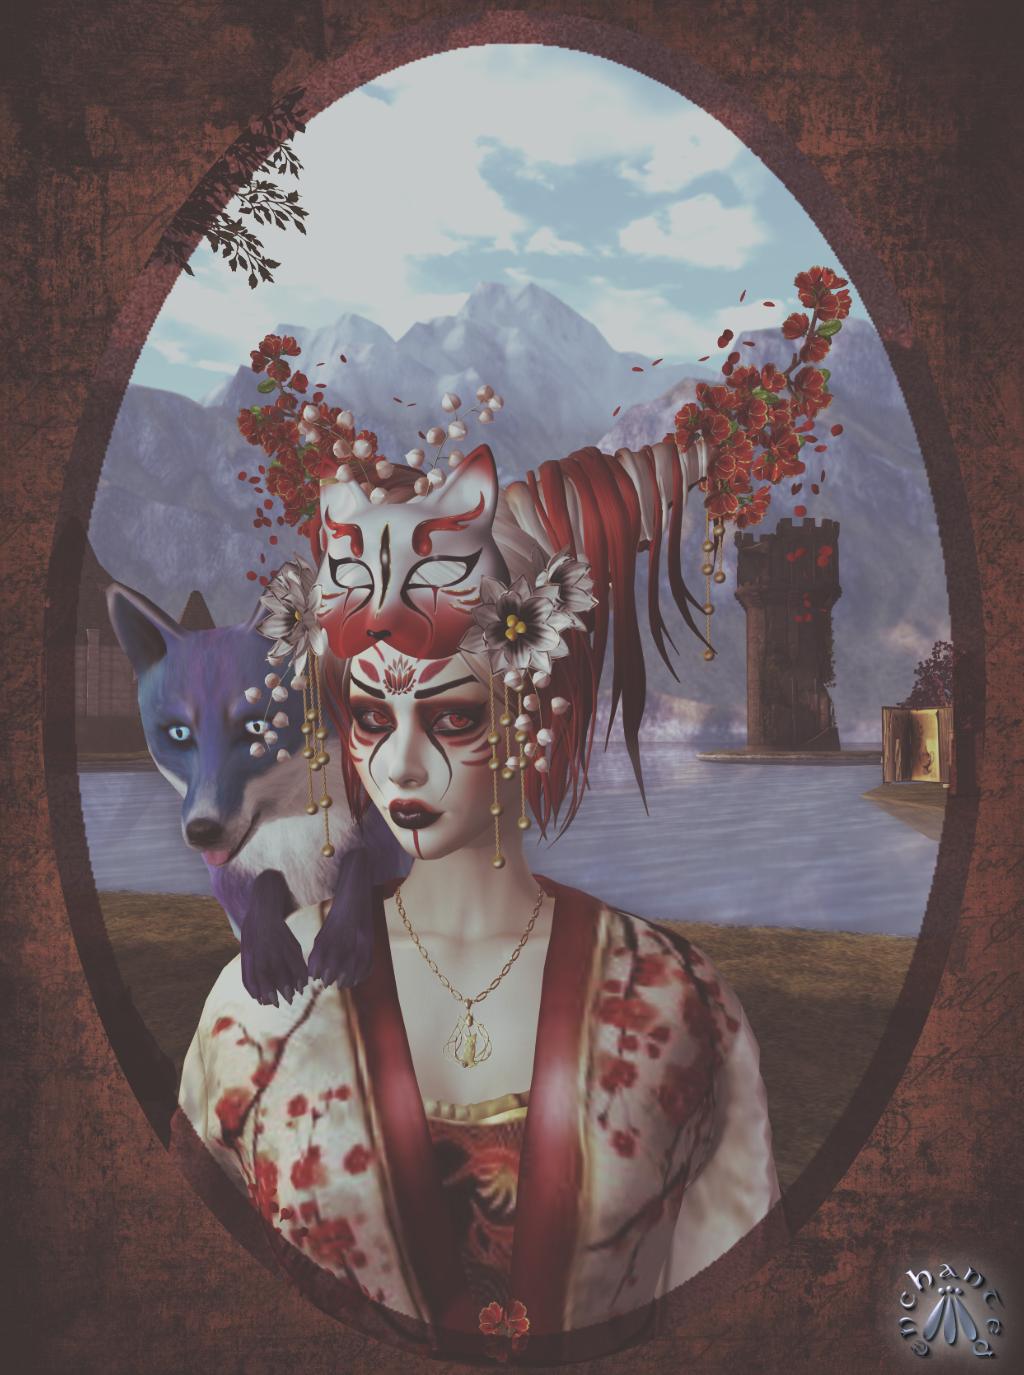 enchantment kitsune 3 edit - 19 BLOG